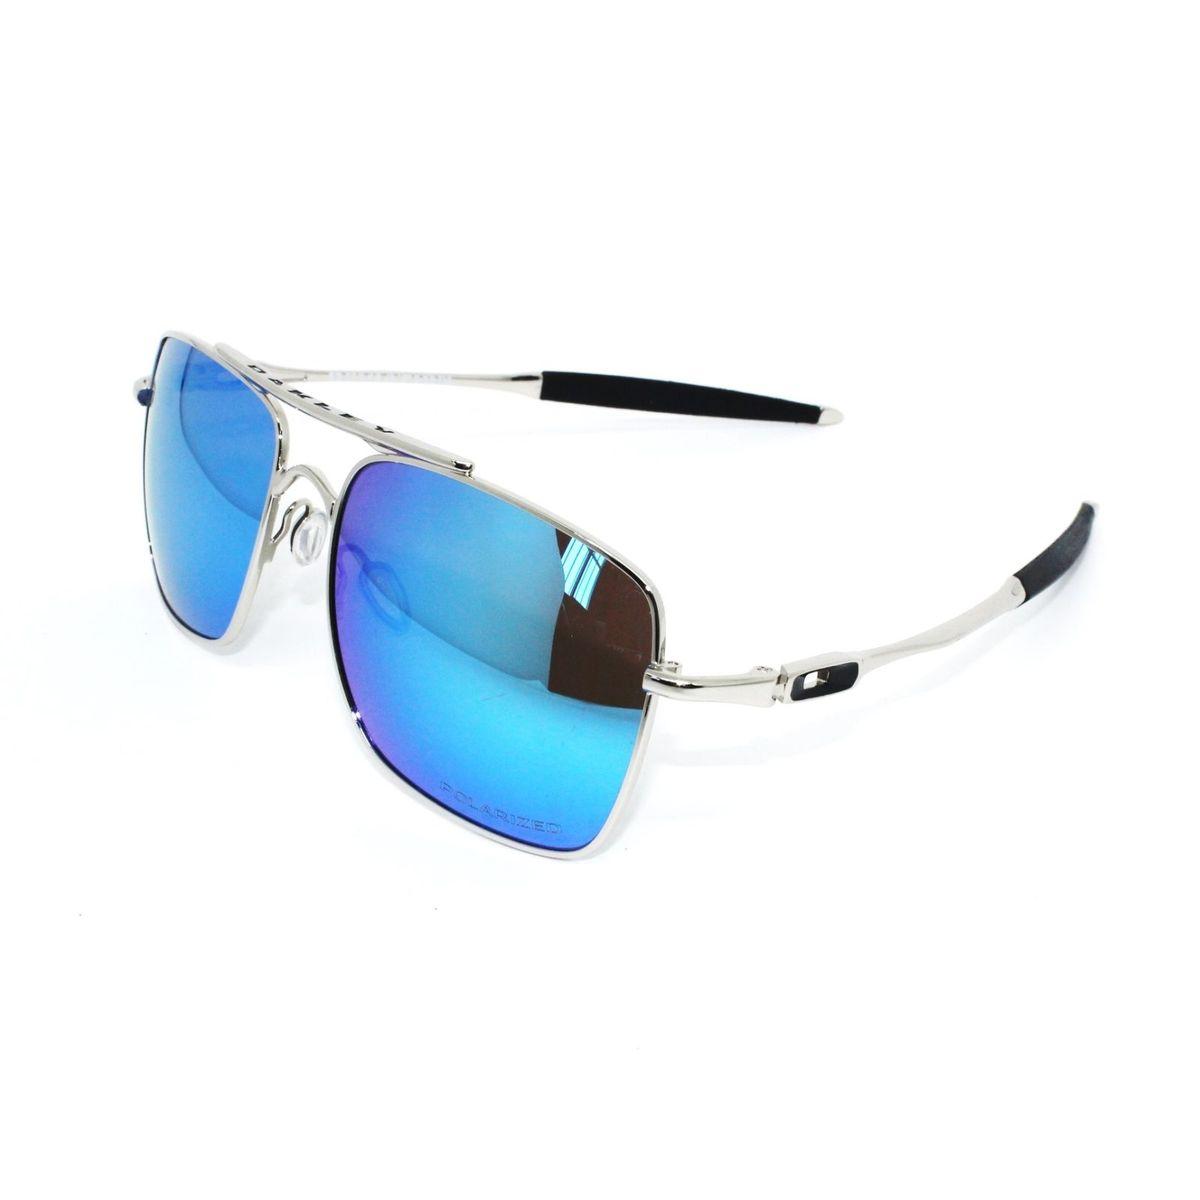 óculos oakley deviation 100% polarizado promoção!!! - óculos oakley 34cc3587f5